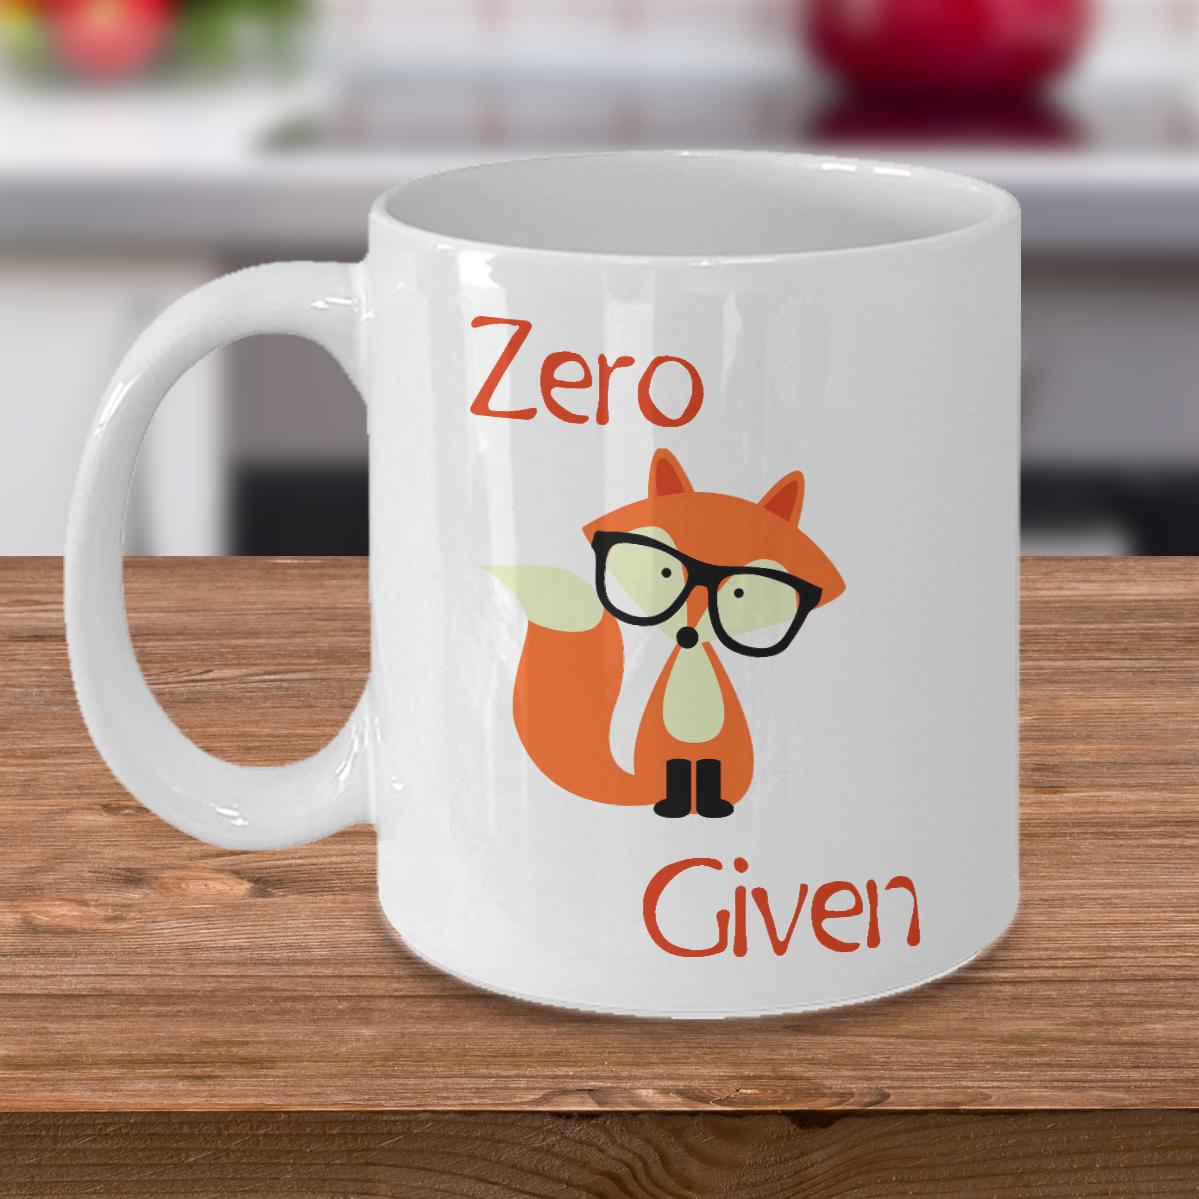 Zero Fox Given - Curse Mug - Coffee Cup Mug - Tea Mug - Ceramic Mug Gift - Coffee Lover - Gift for Crafty Friend